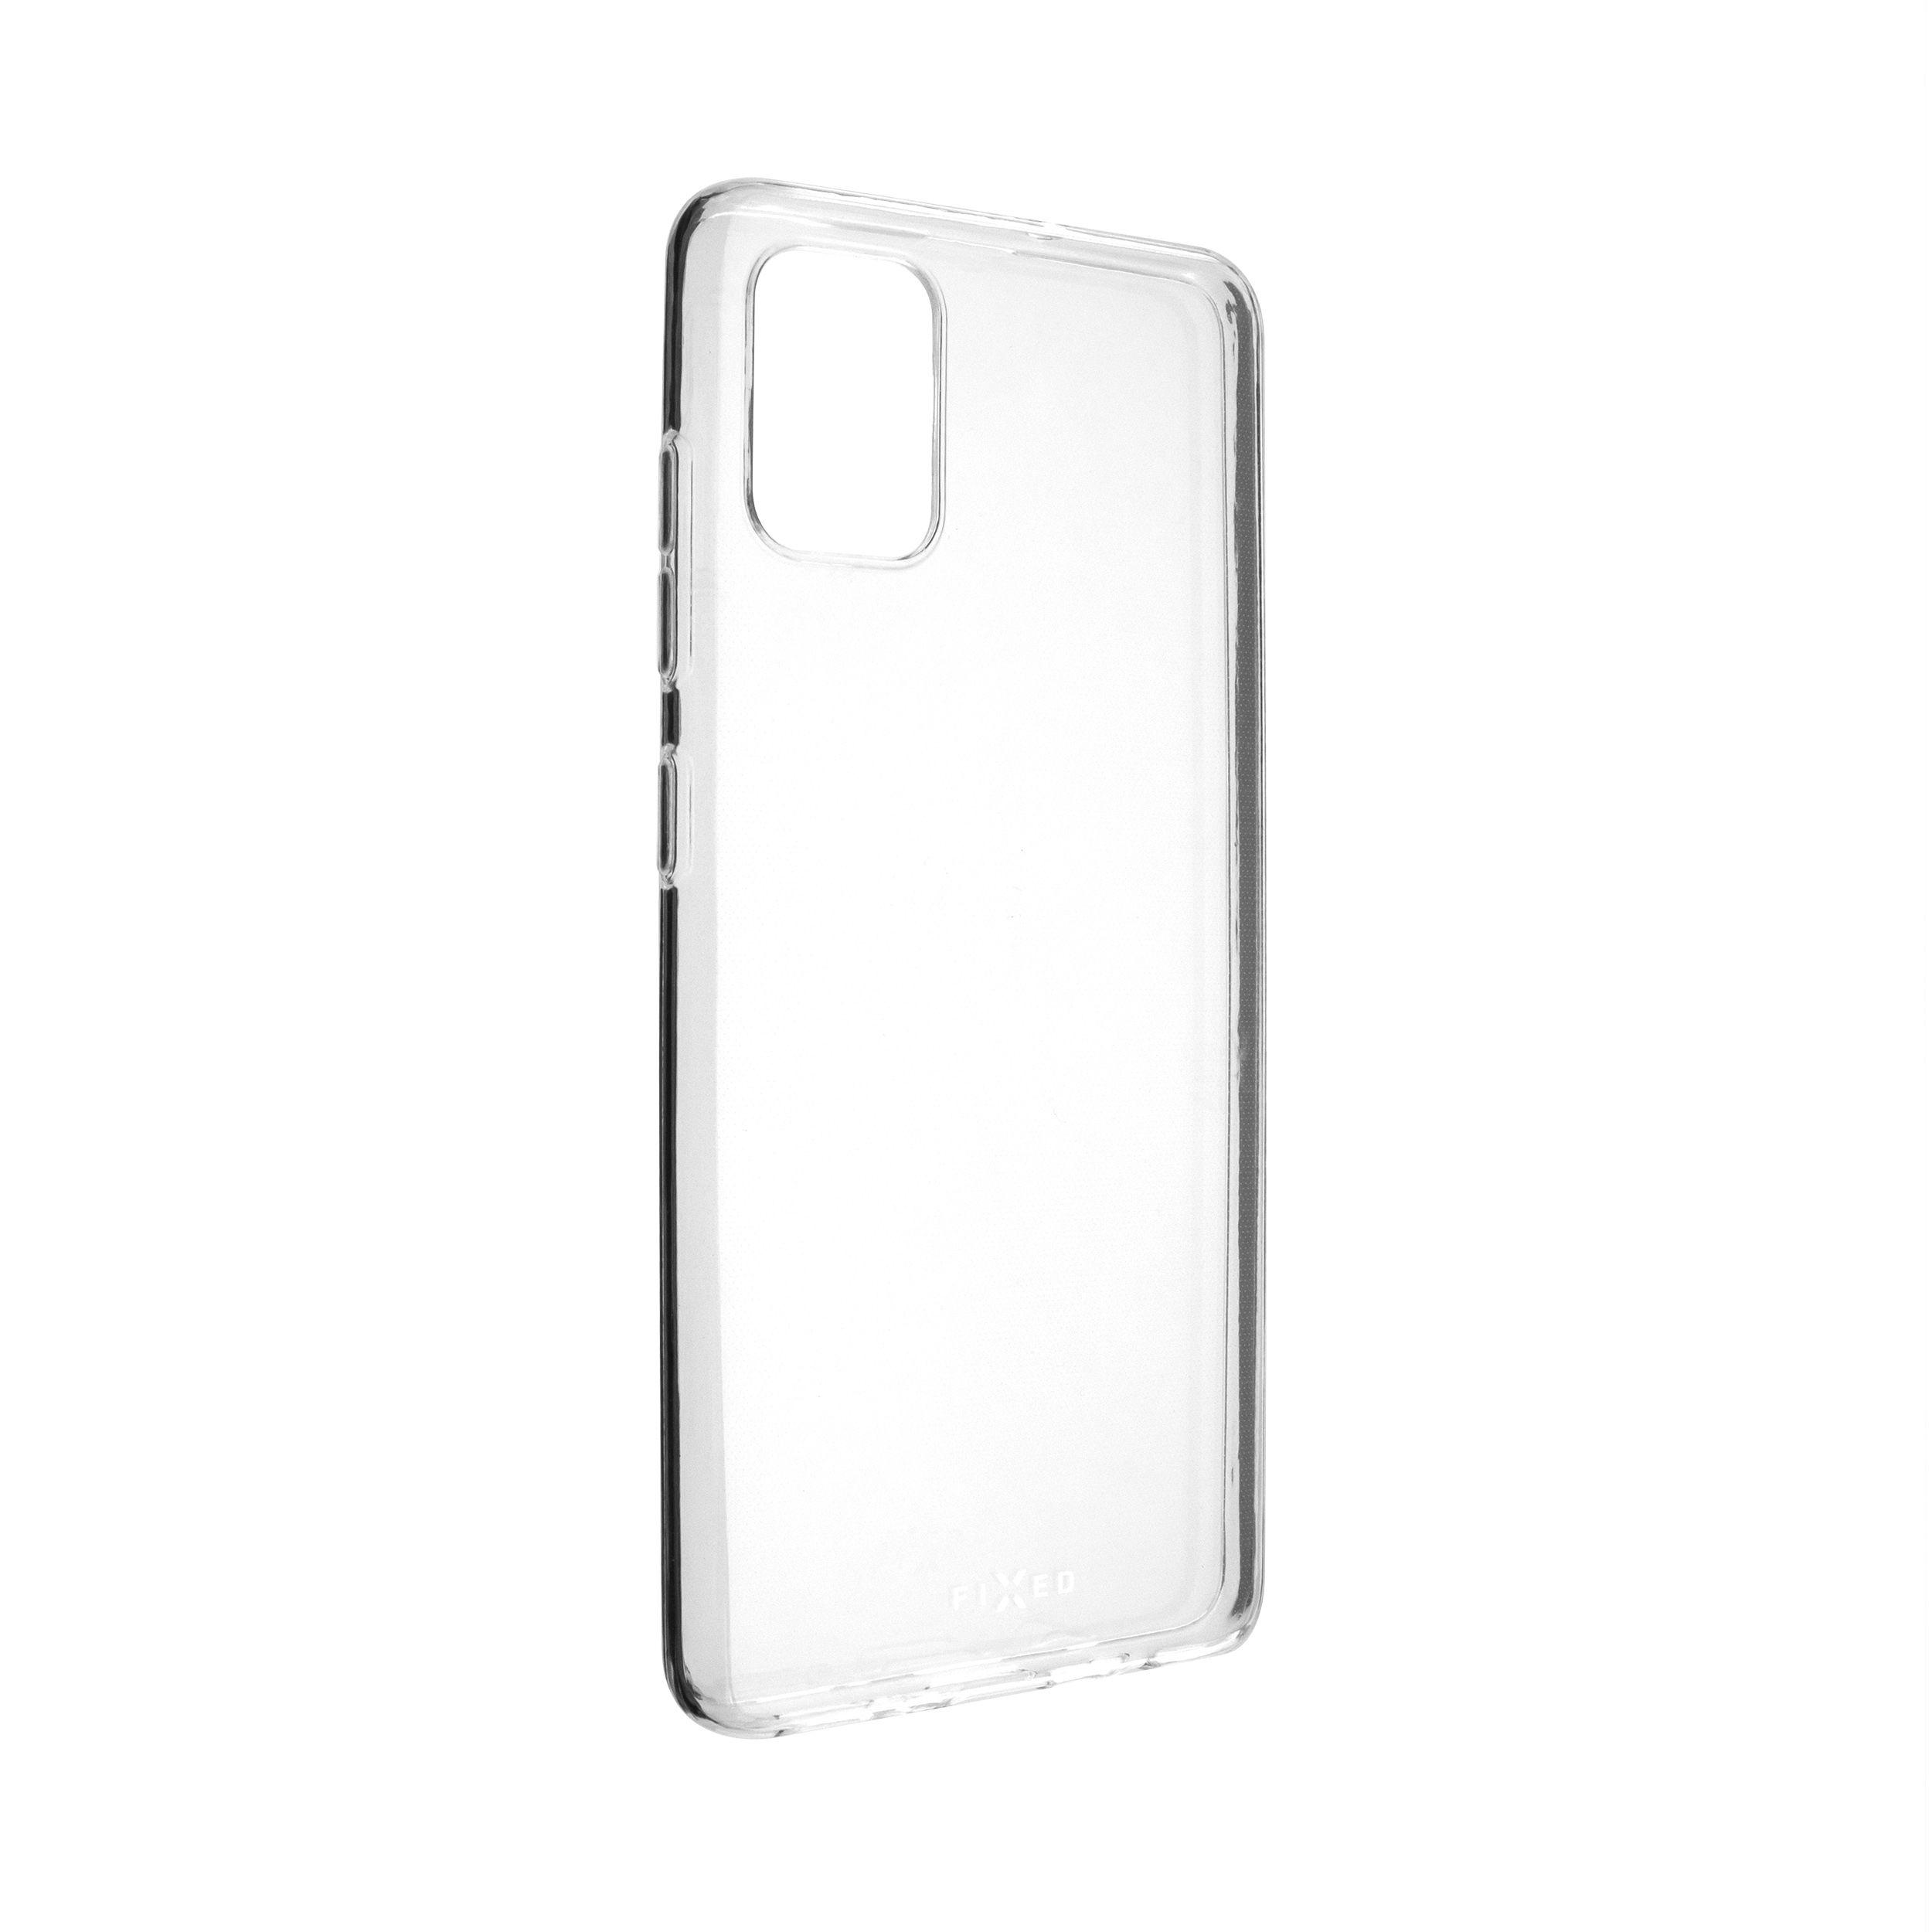 TPU gelové pouzdro FIXED pro Samsung Galaxy A51, čiré